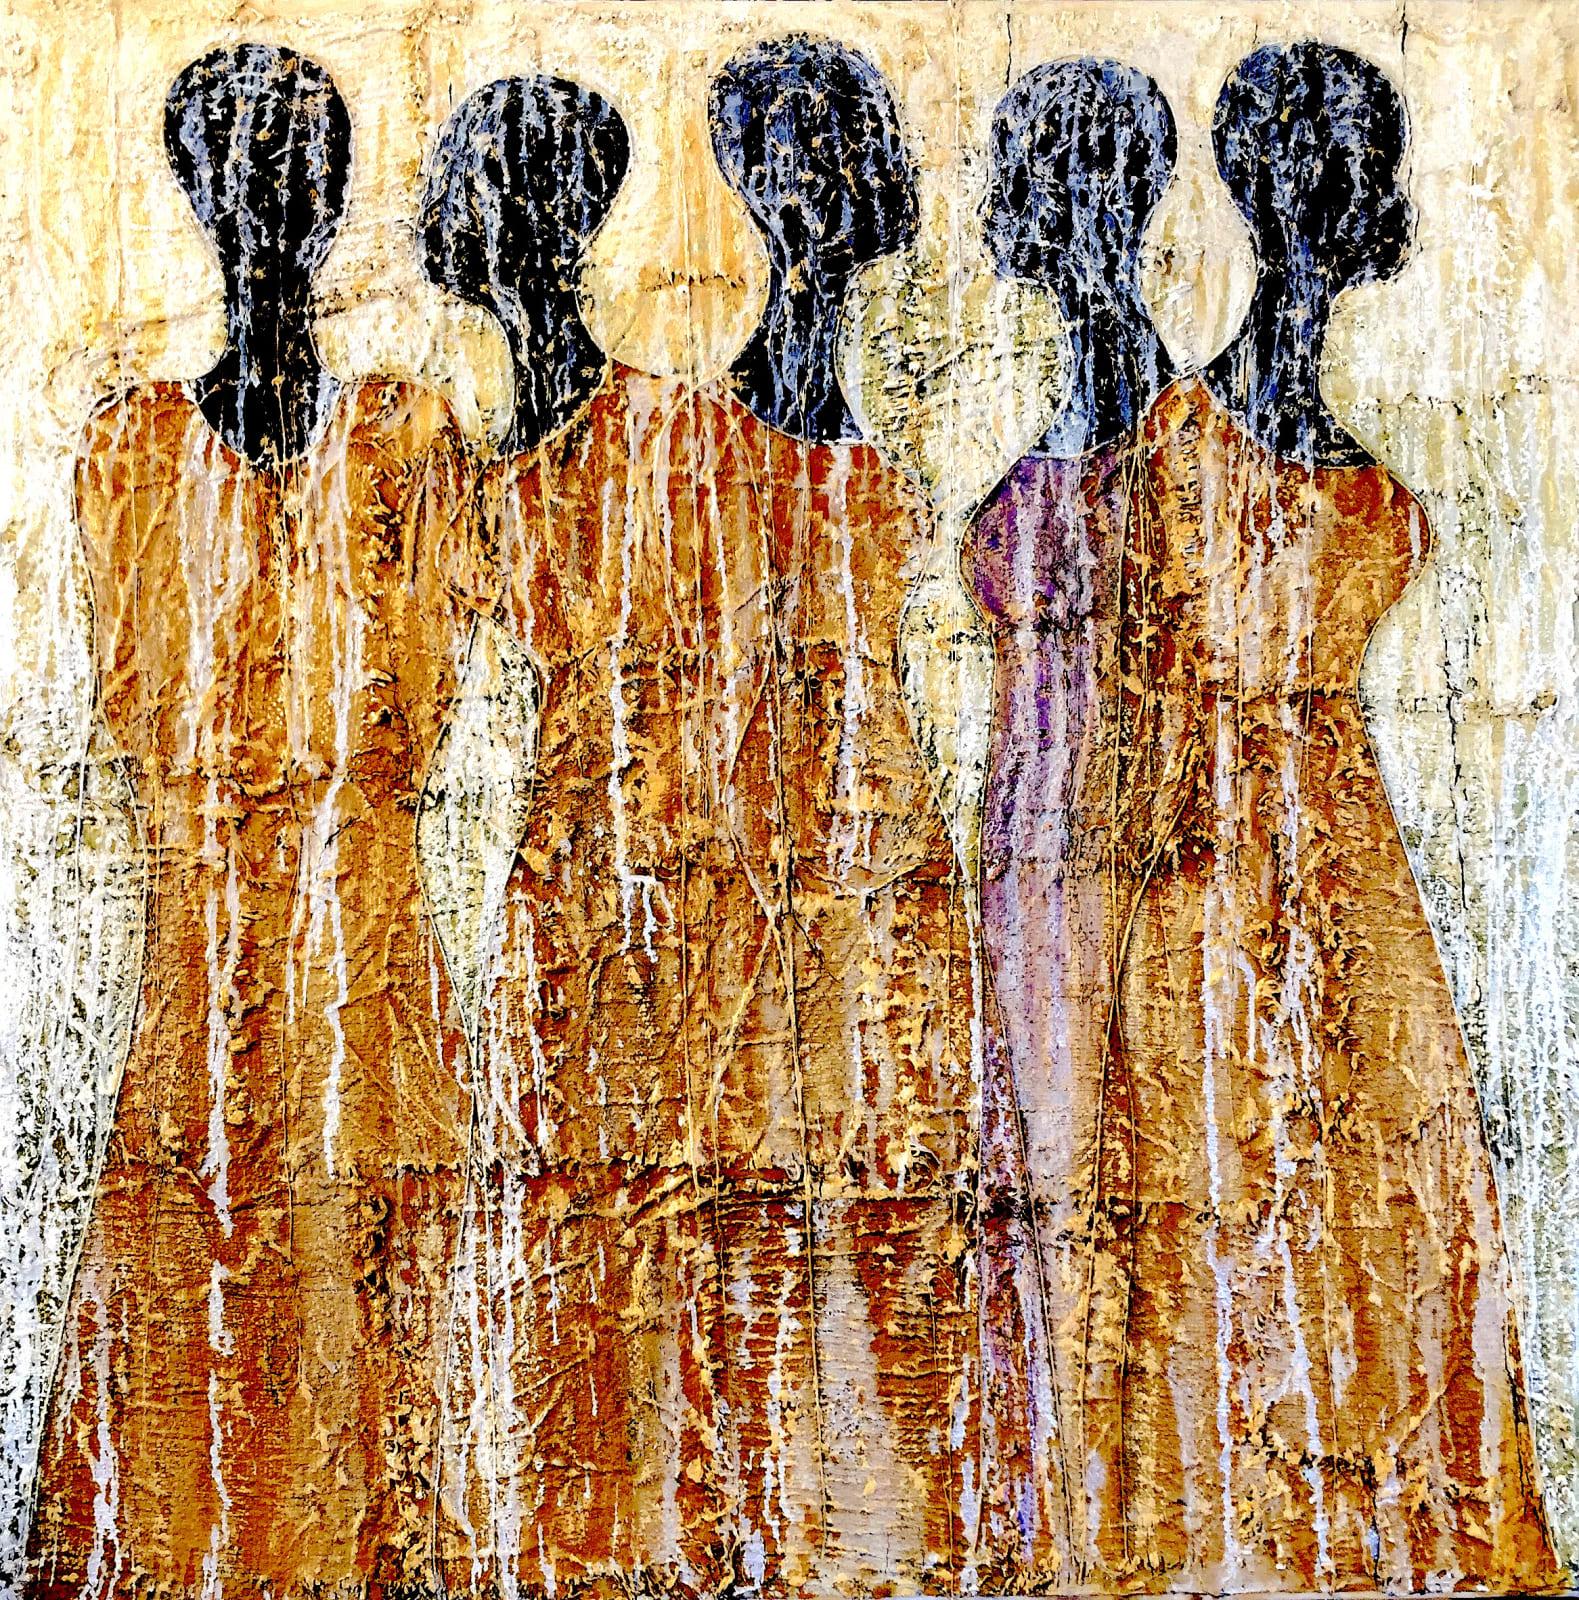 Uchay Chima, Five Graces, 2018